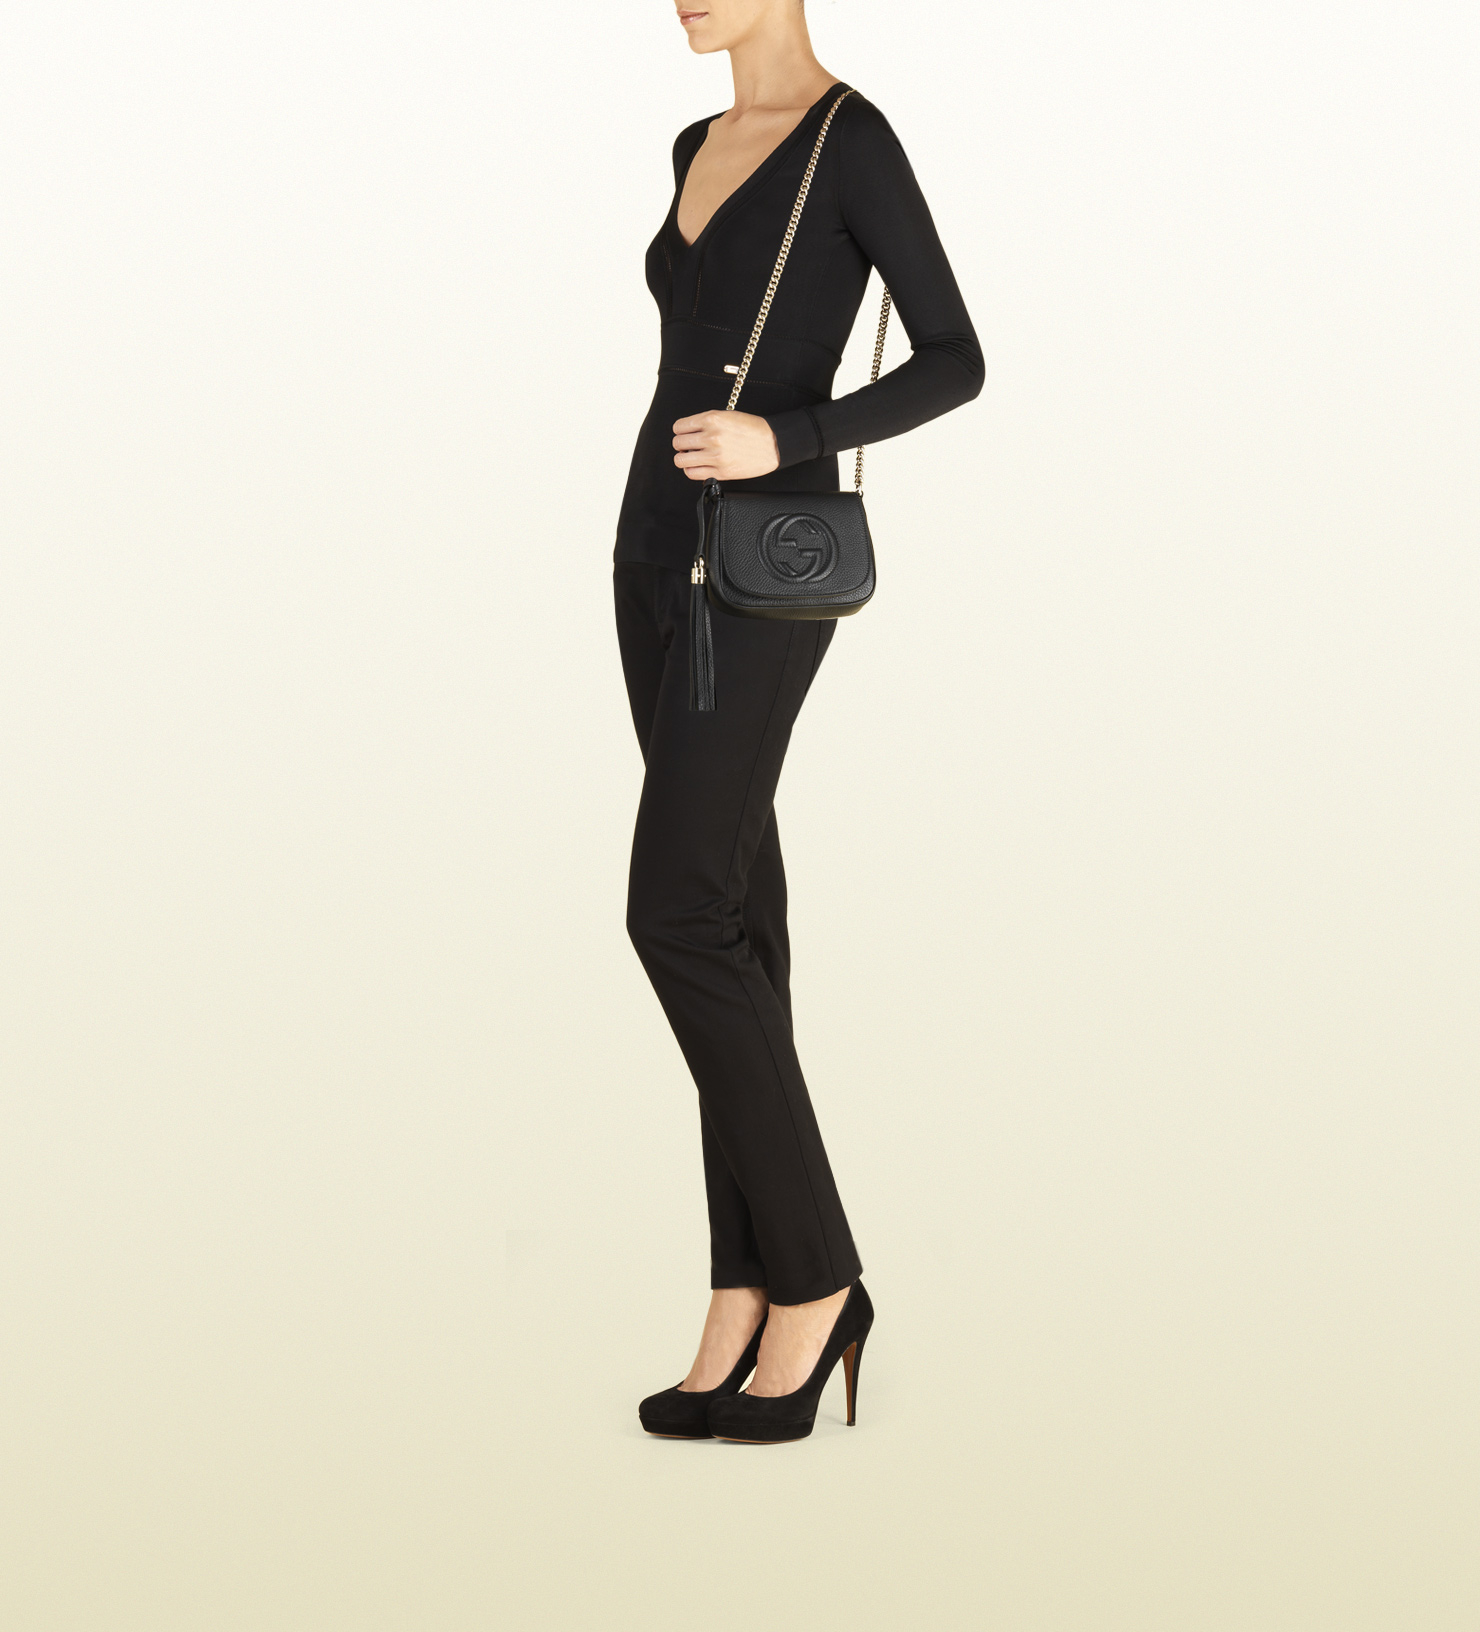 1b191997198a Gucci Soho Gg Leather Cross-body Bag in Black - Lyst